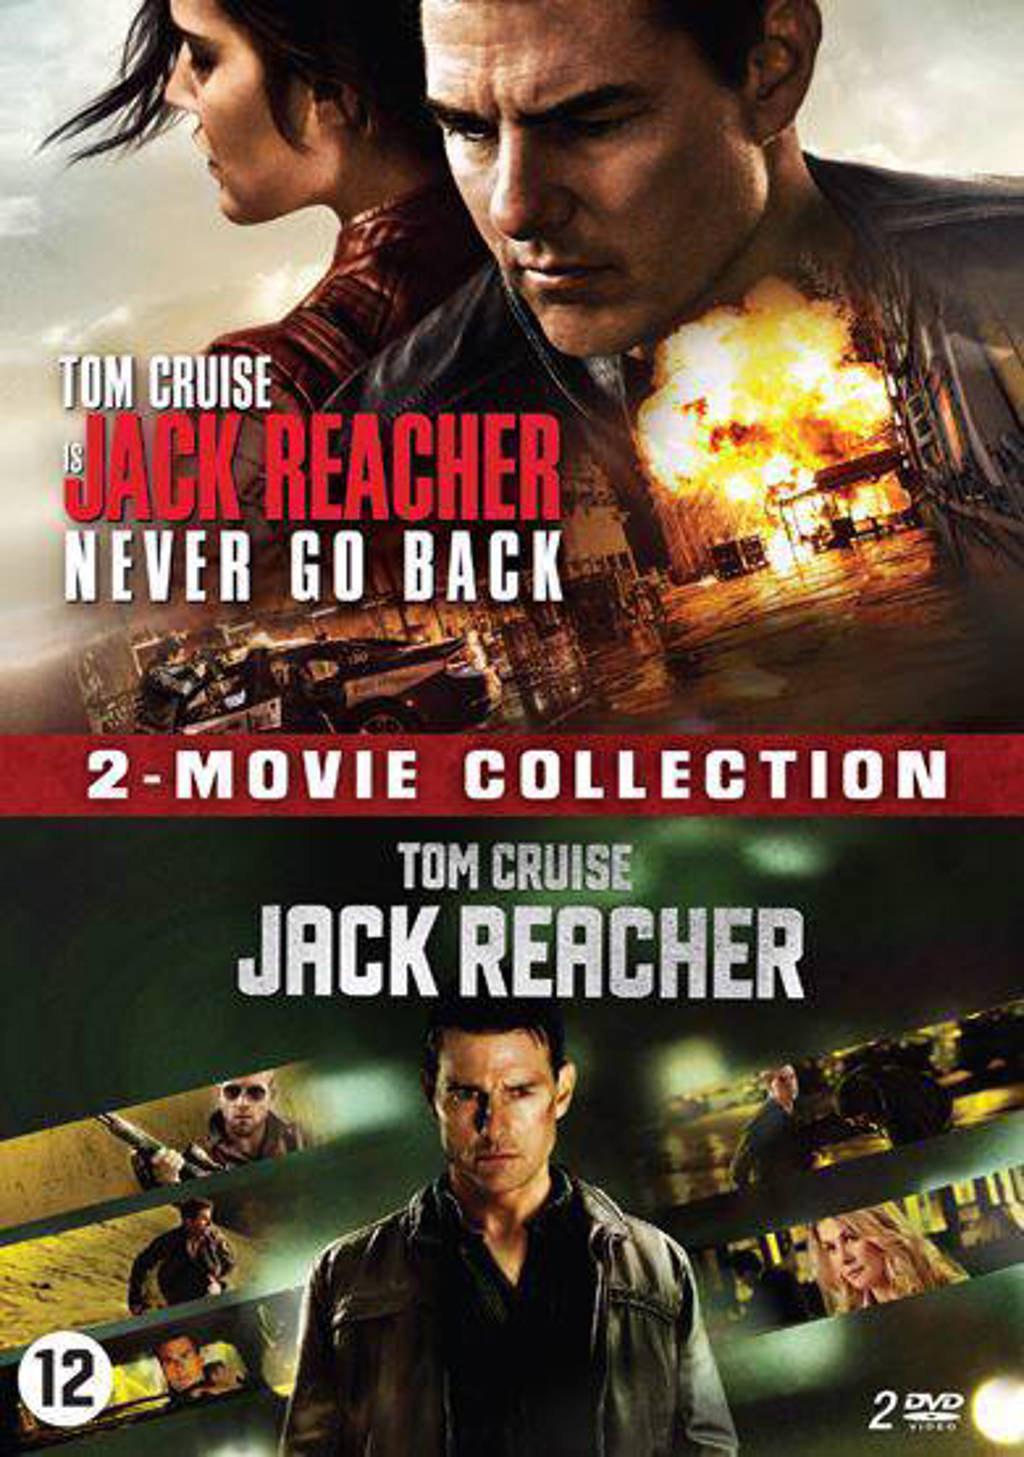 Jack Reacher 1 & 2 DVD